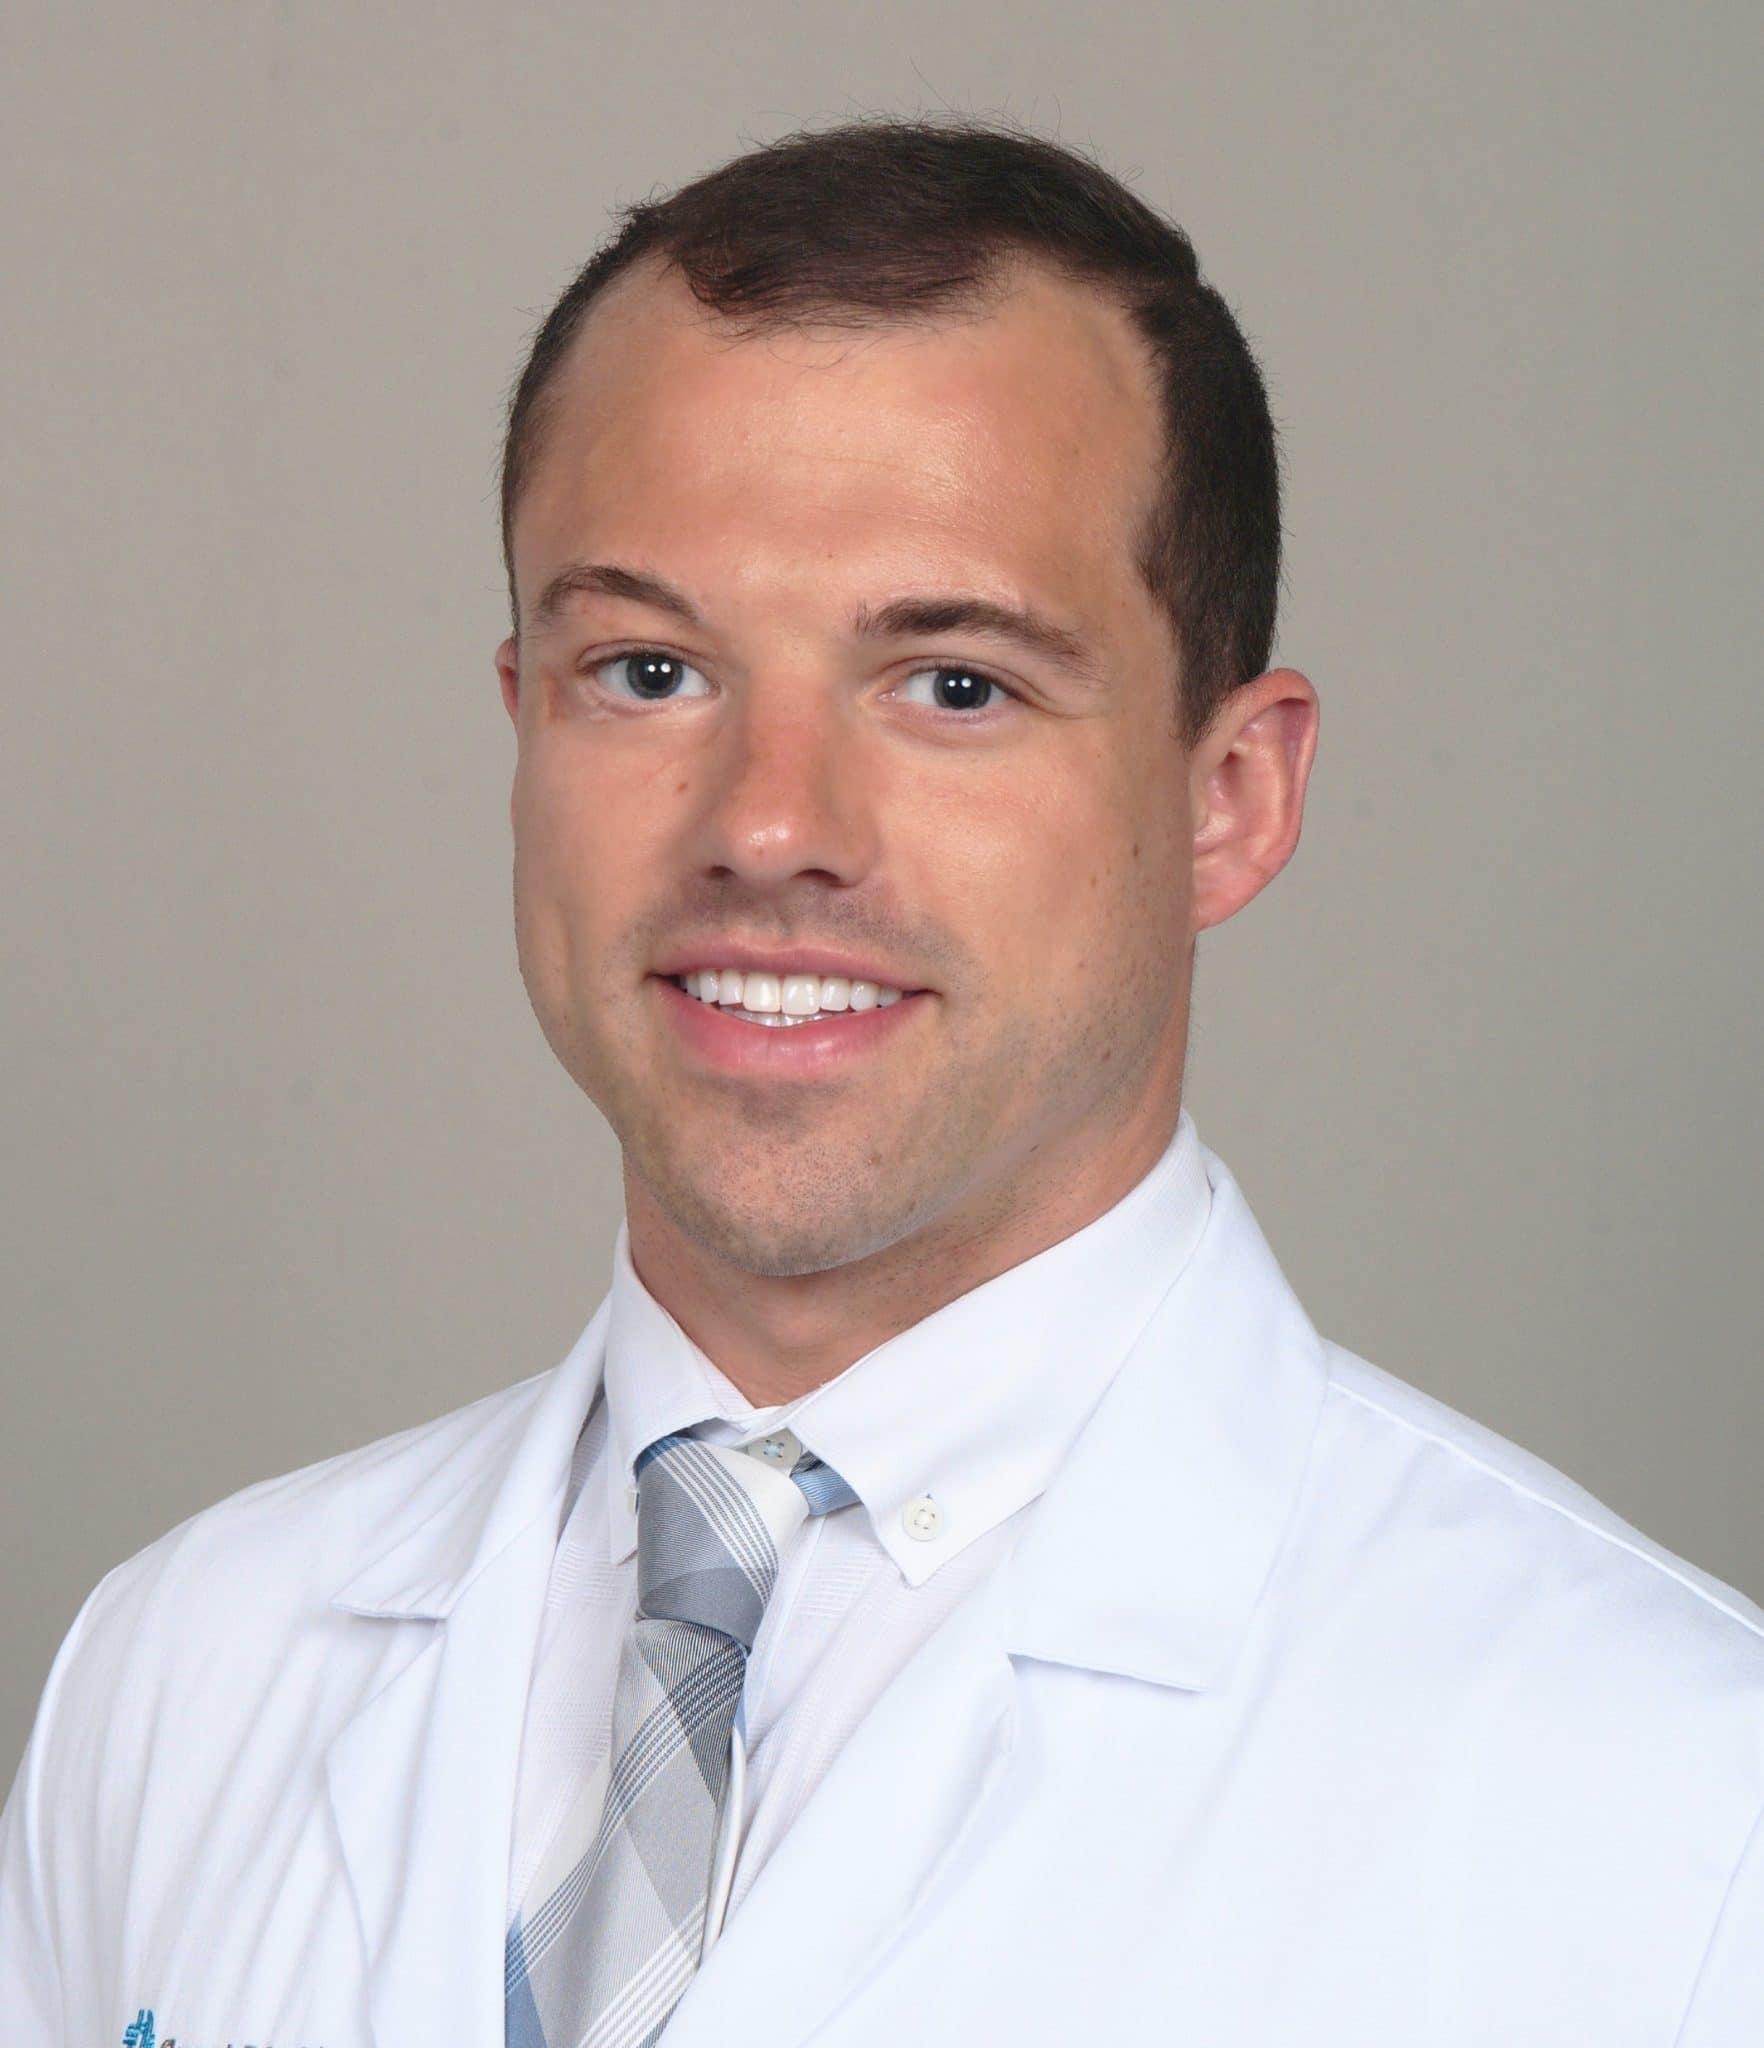 Photo of Matthew D. Wilson, DPM